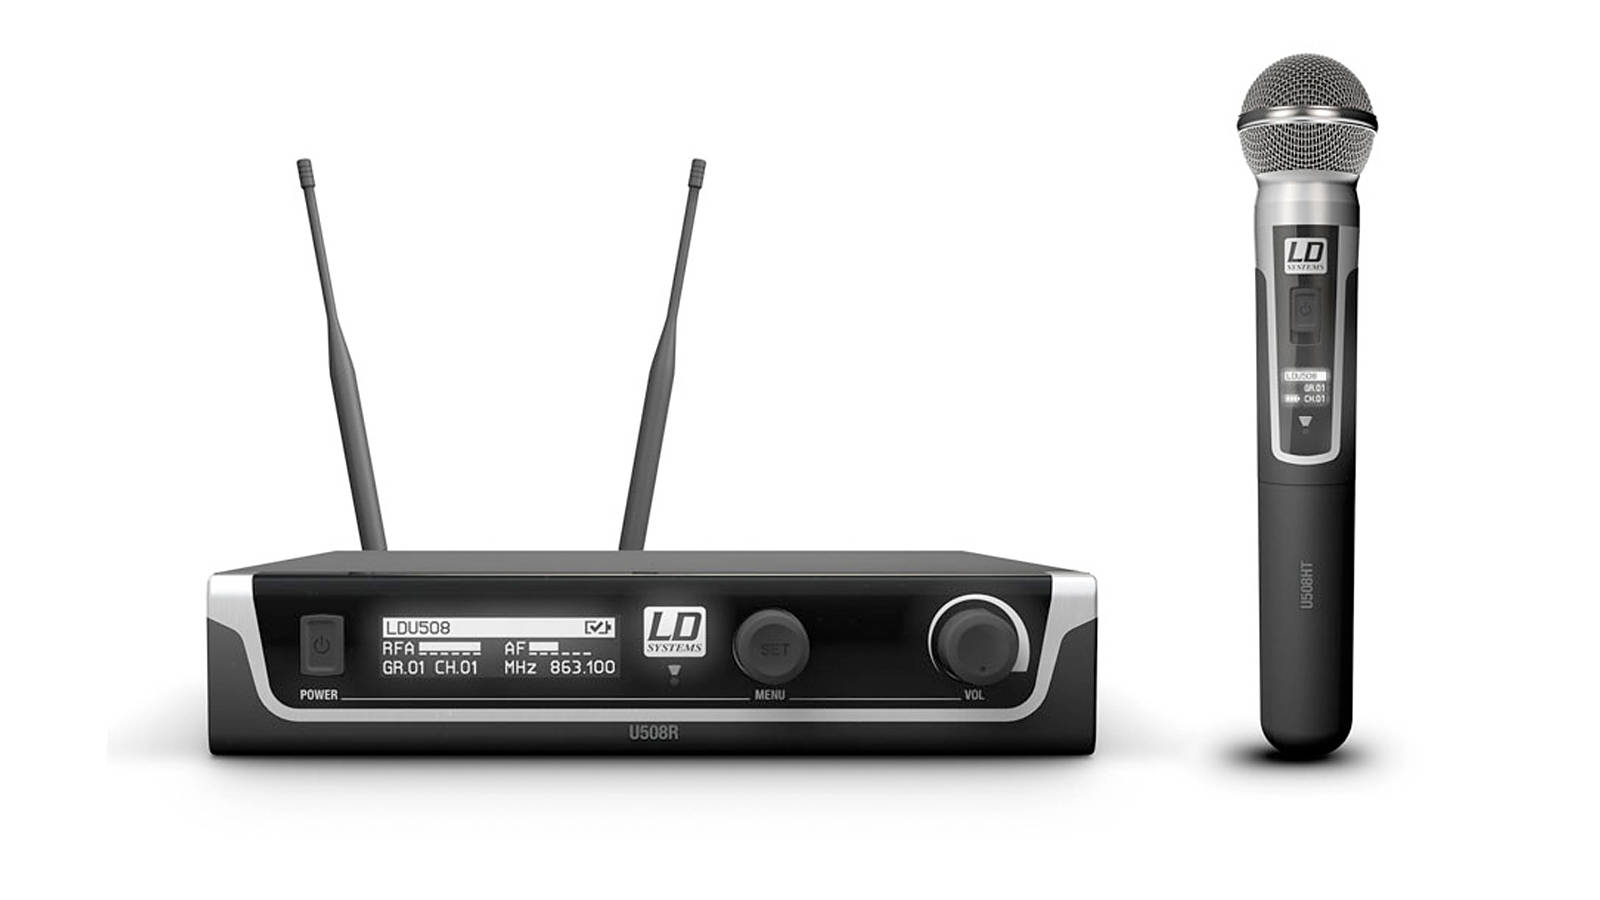 LD-Systems U508 HHD Handsender Funkmikrofon System